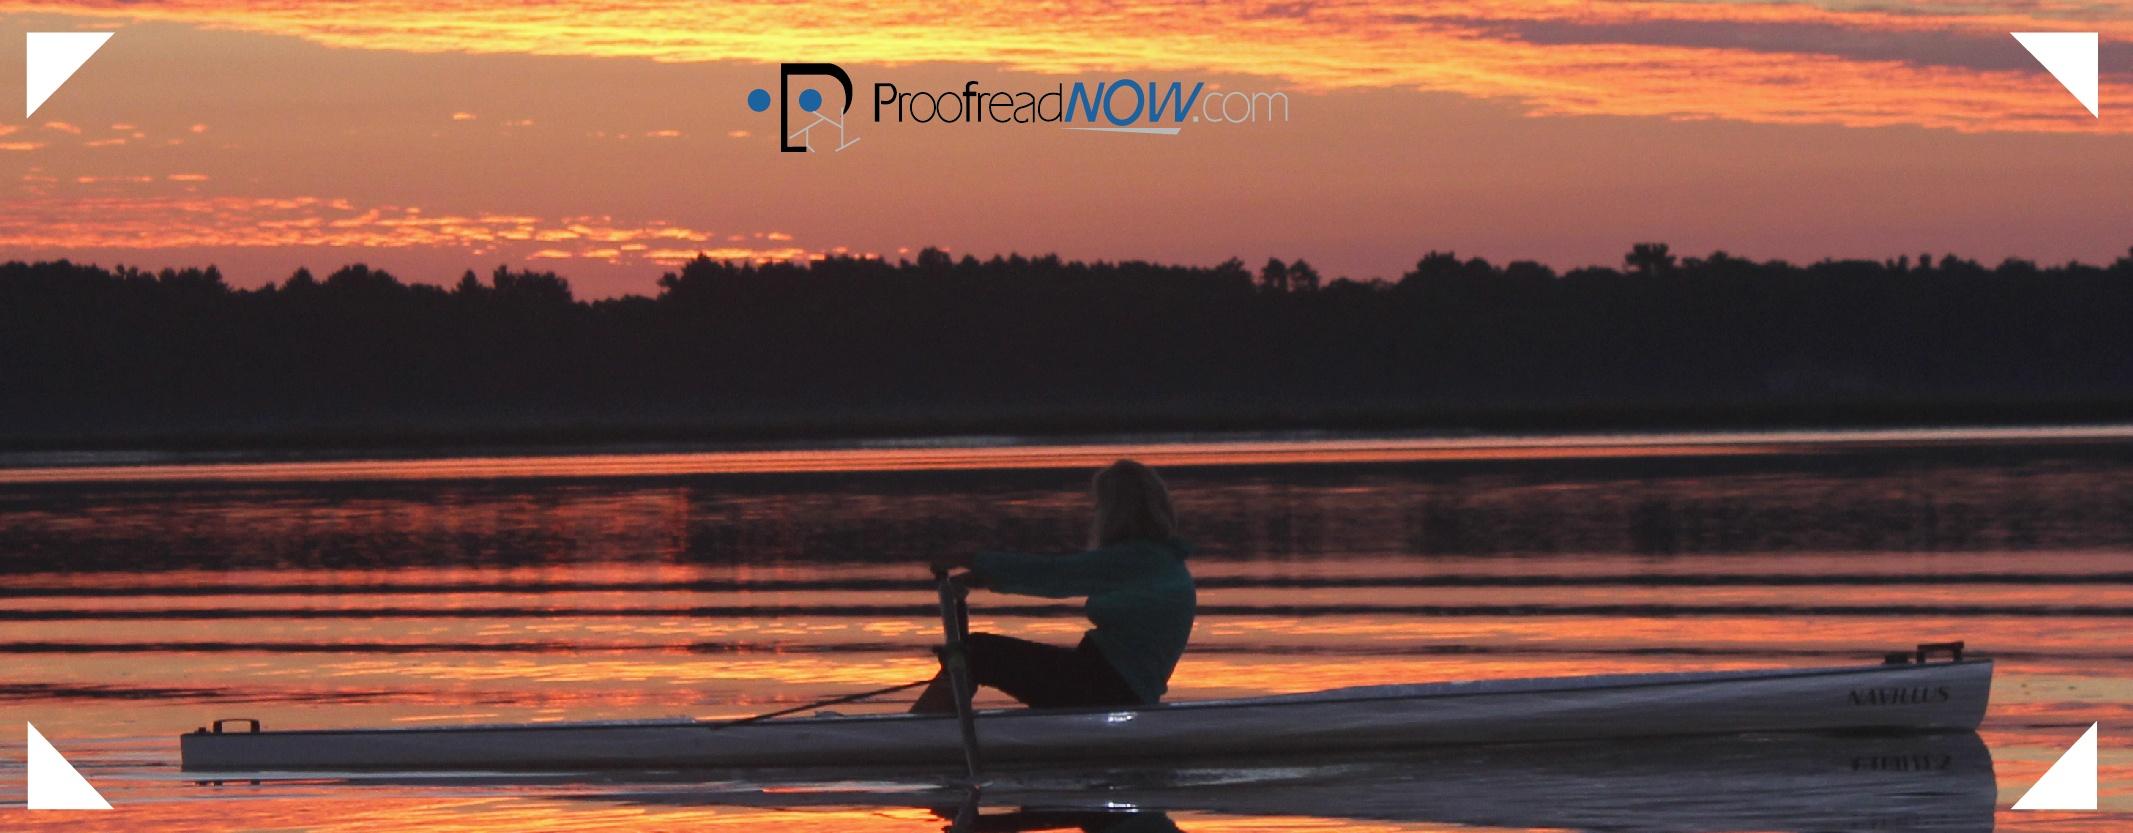 Woman rowing